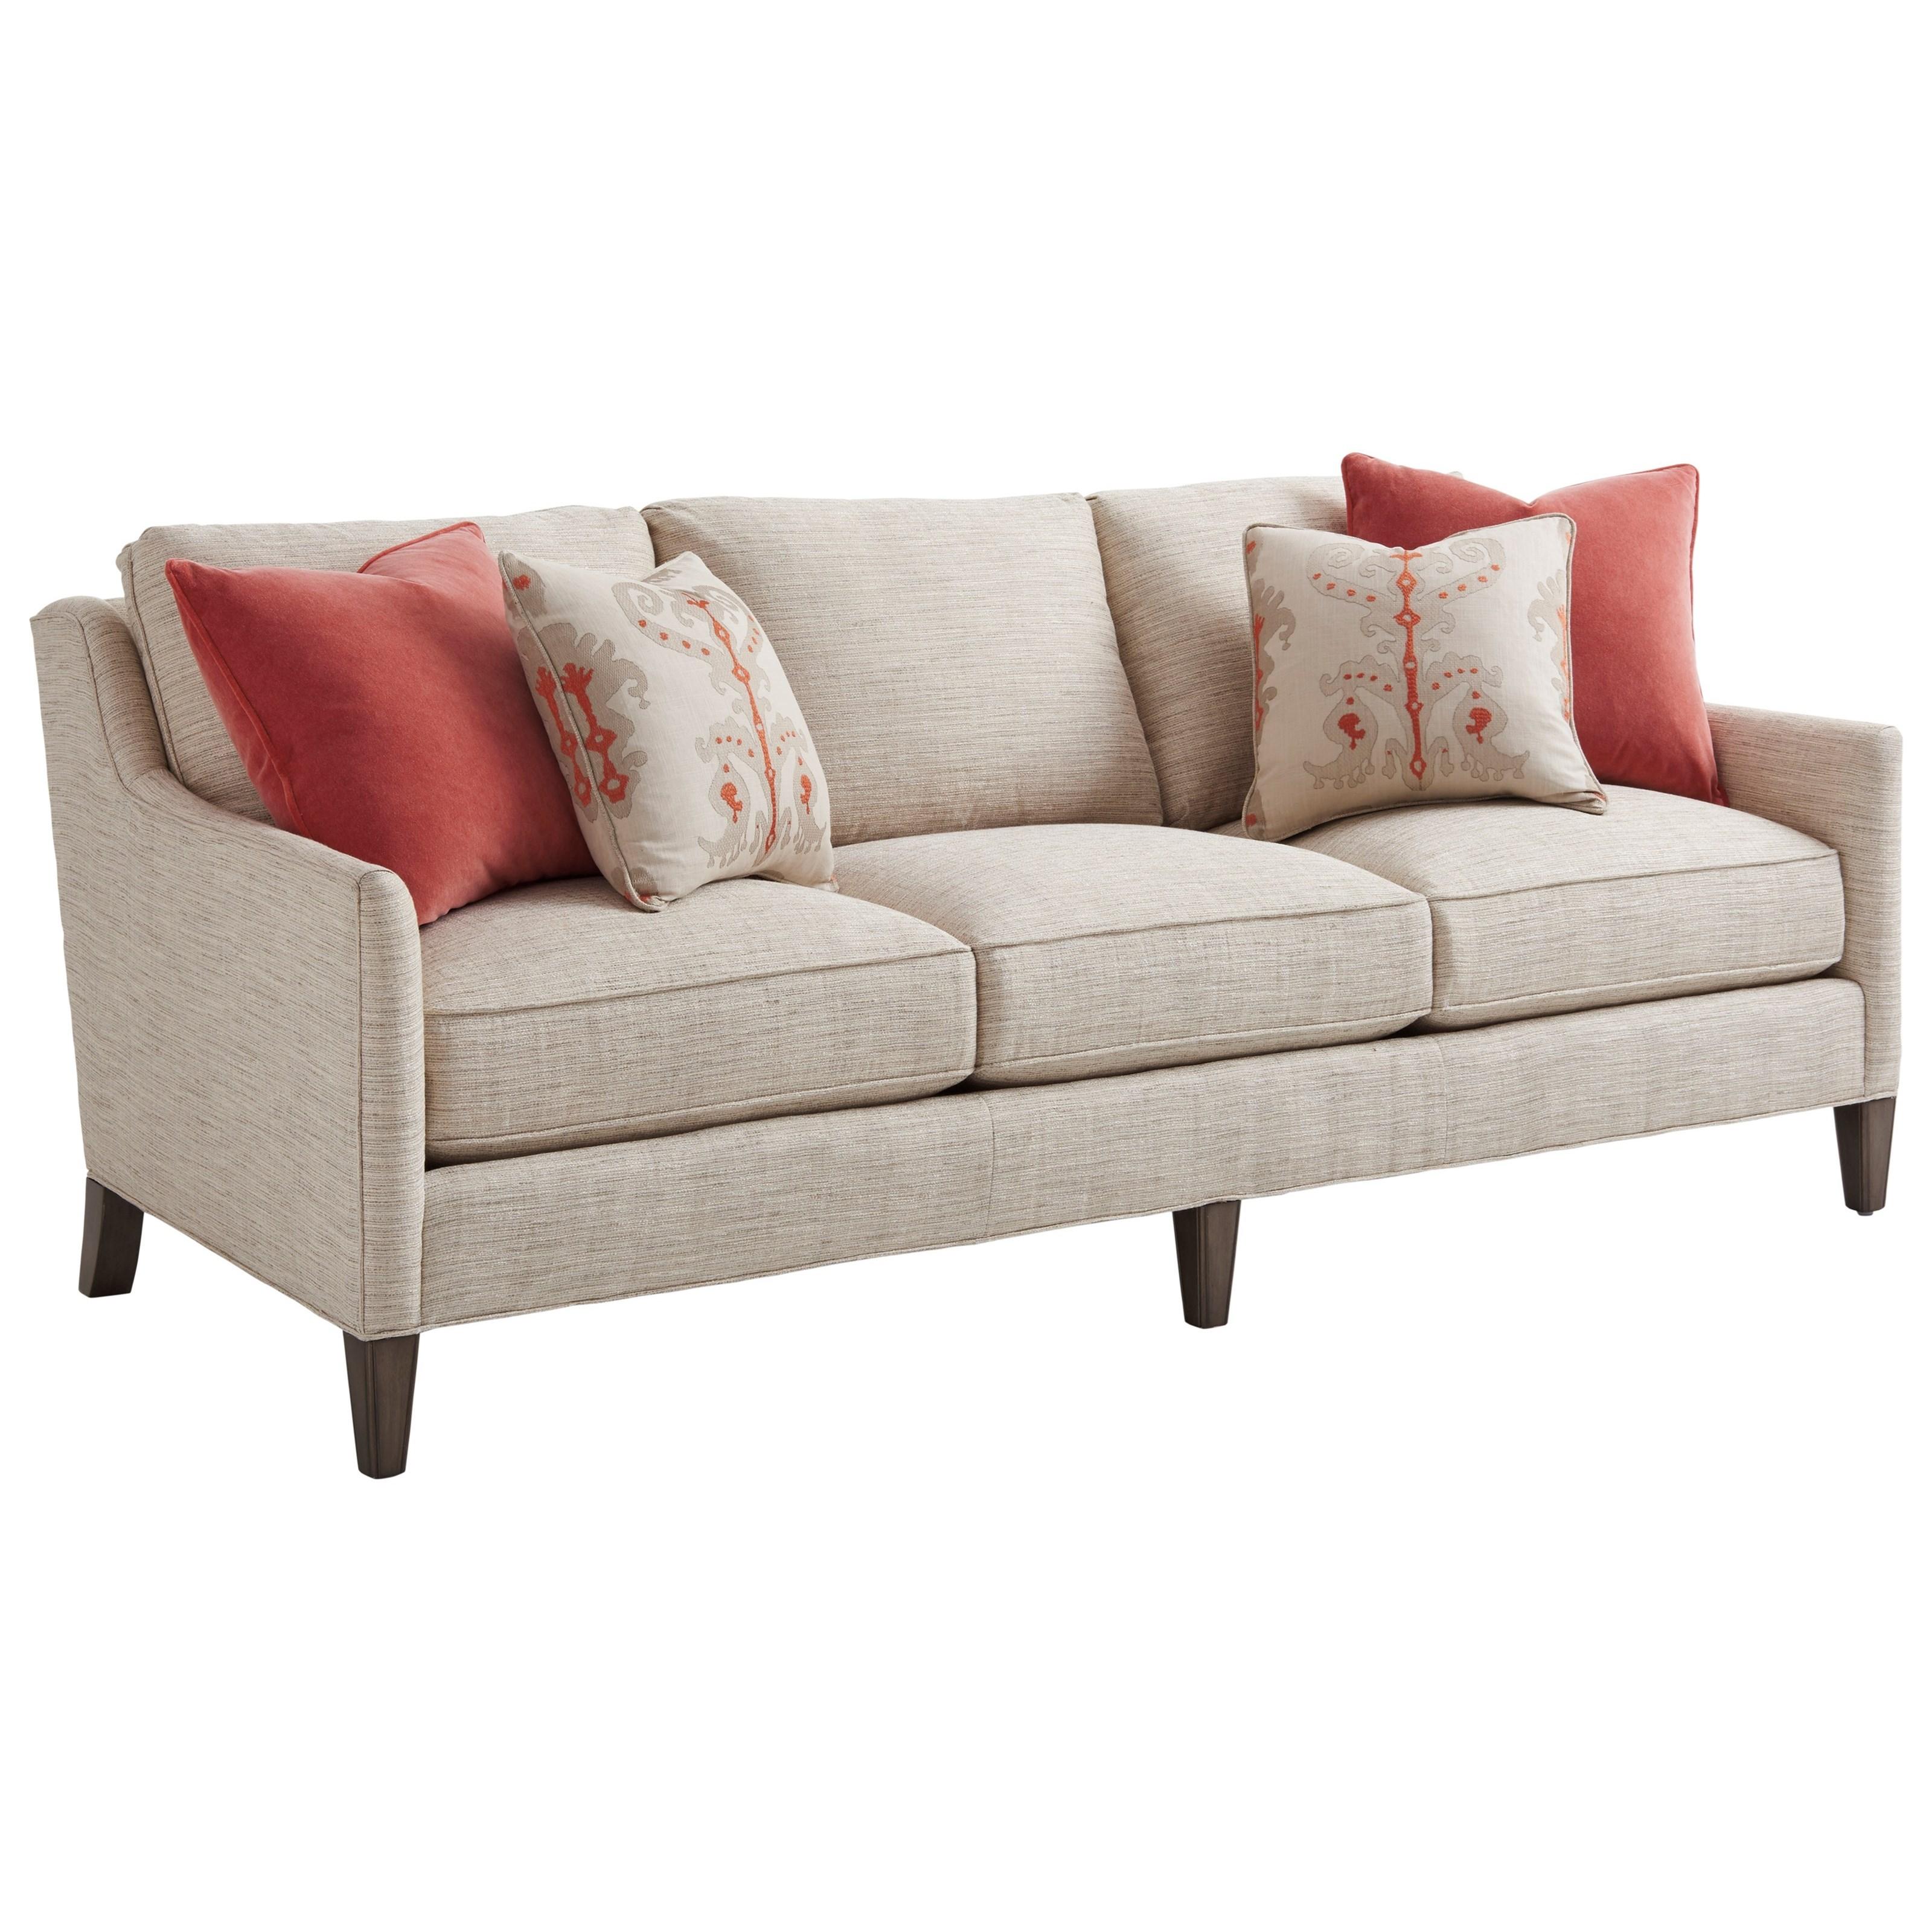 Ariana Turin Sofa by Lexington at Baer's Furniture